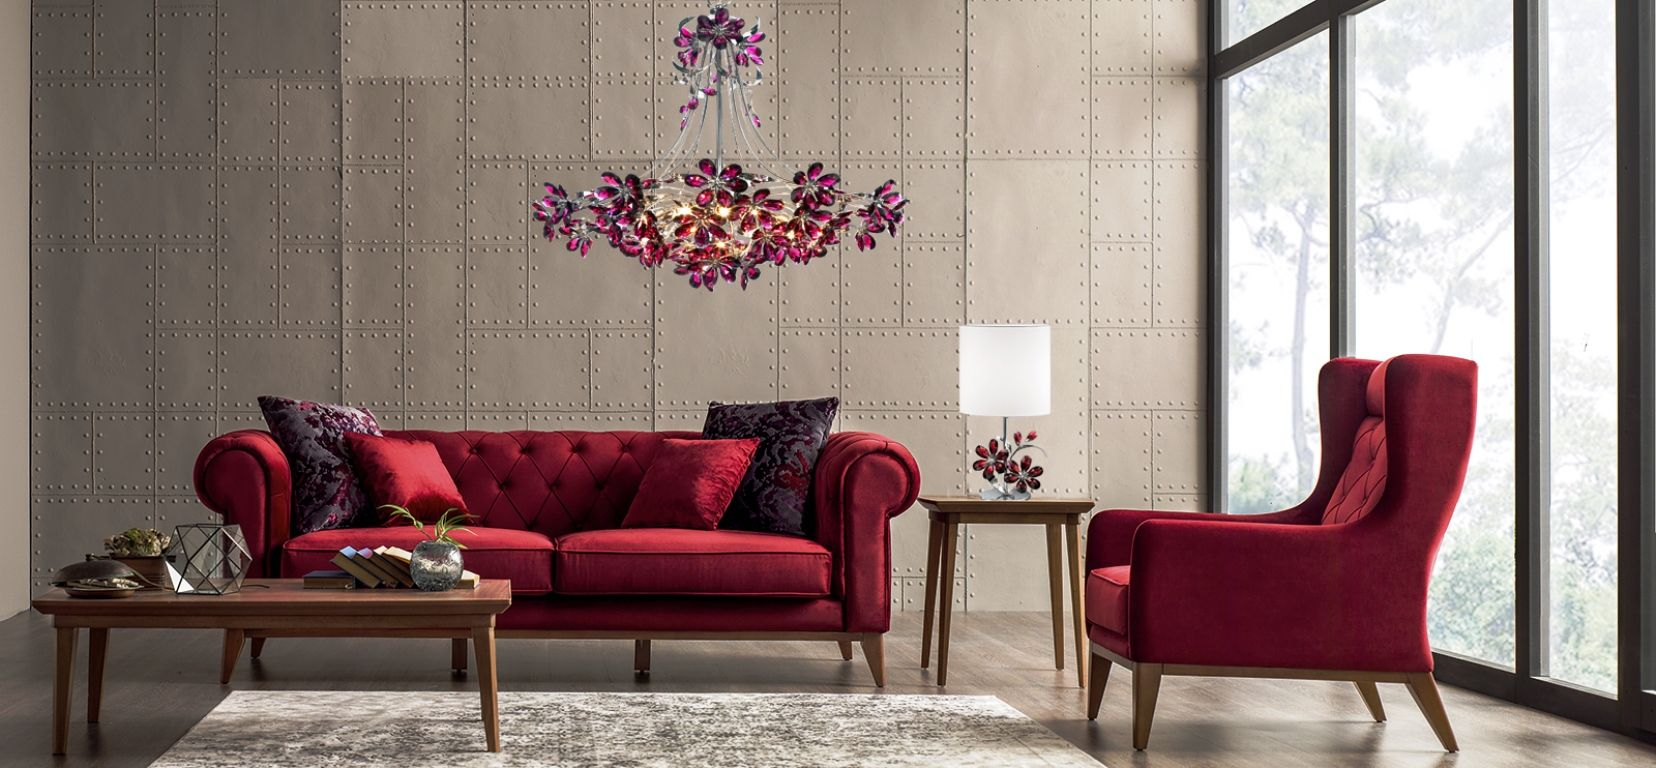 Pin By Amira Hamdy On Pendellampe Original Milano Swarovski 24karat Gold Home Furniture Couch Furniture Decor